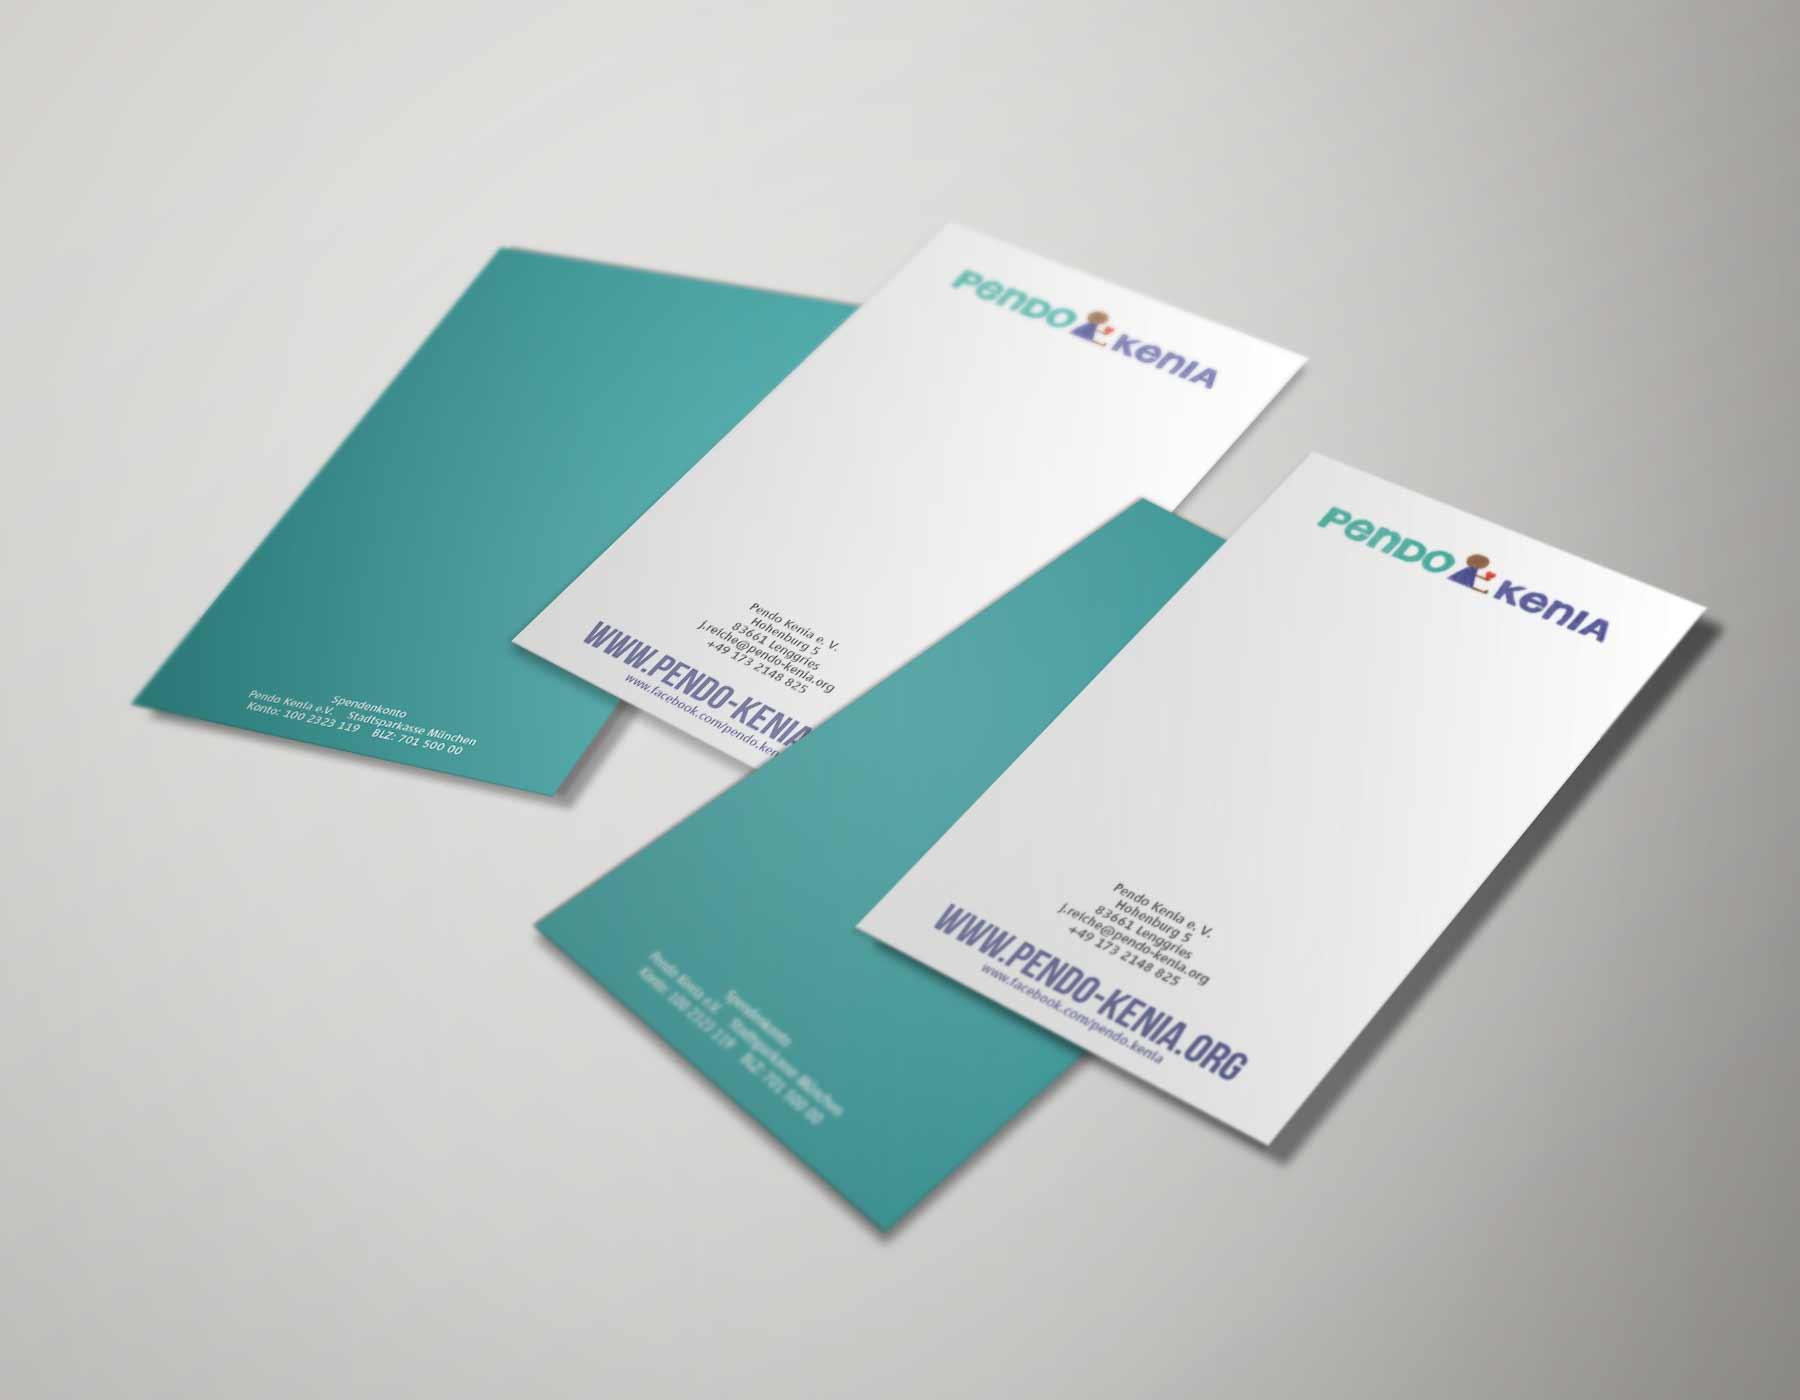 PendoKenia-mockup-flyer01